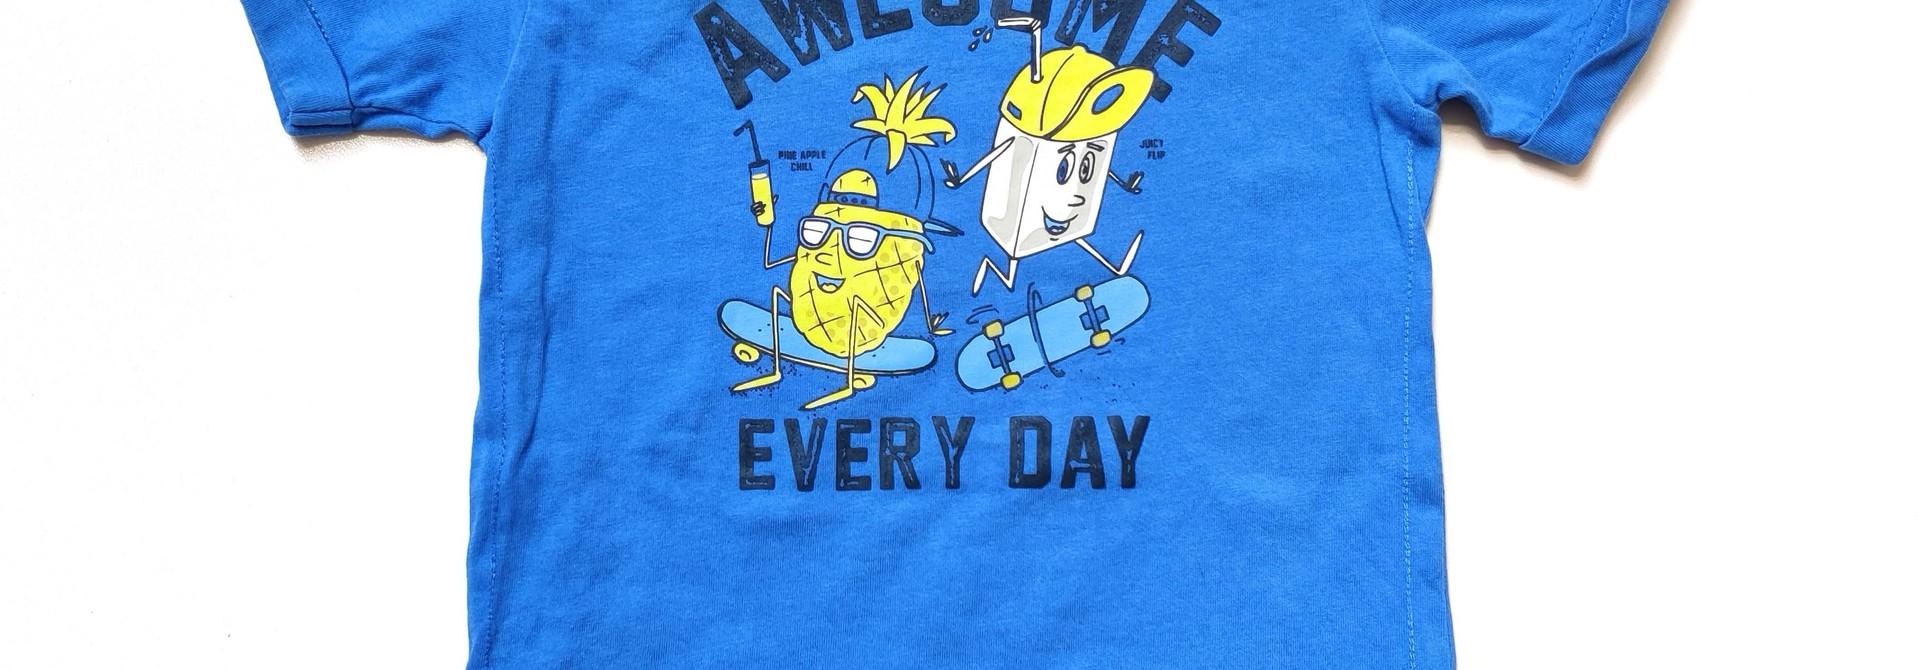 T-shirt Someone